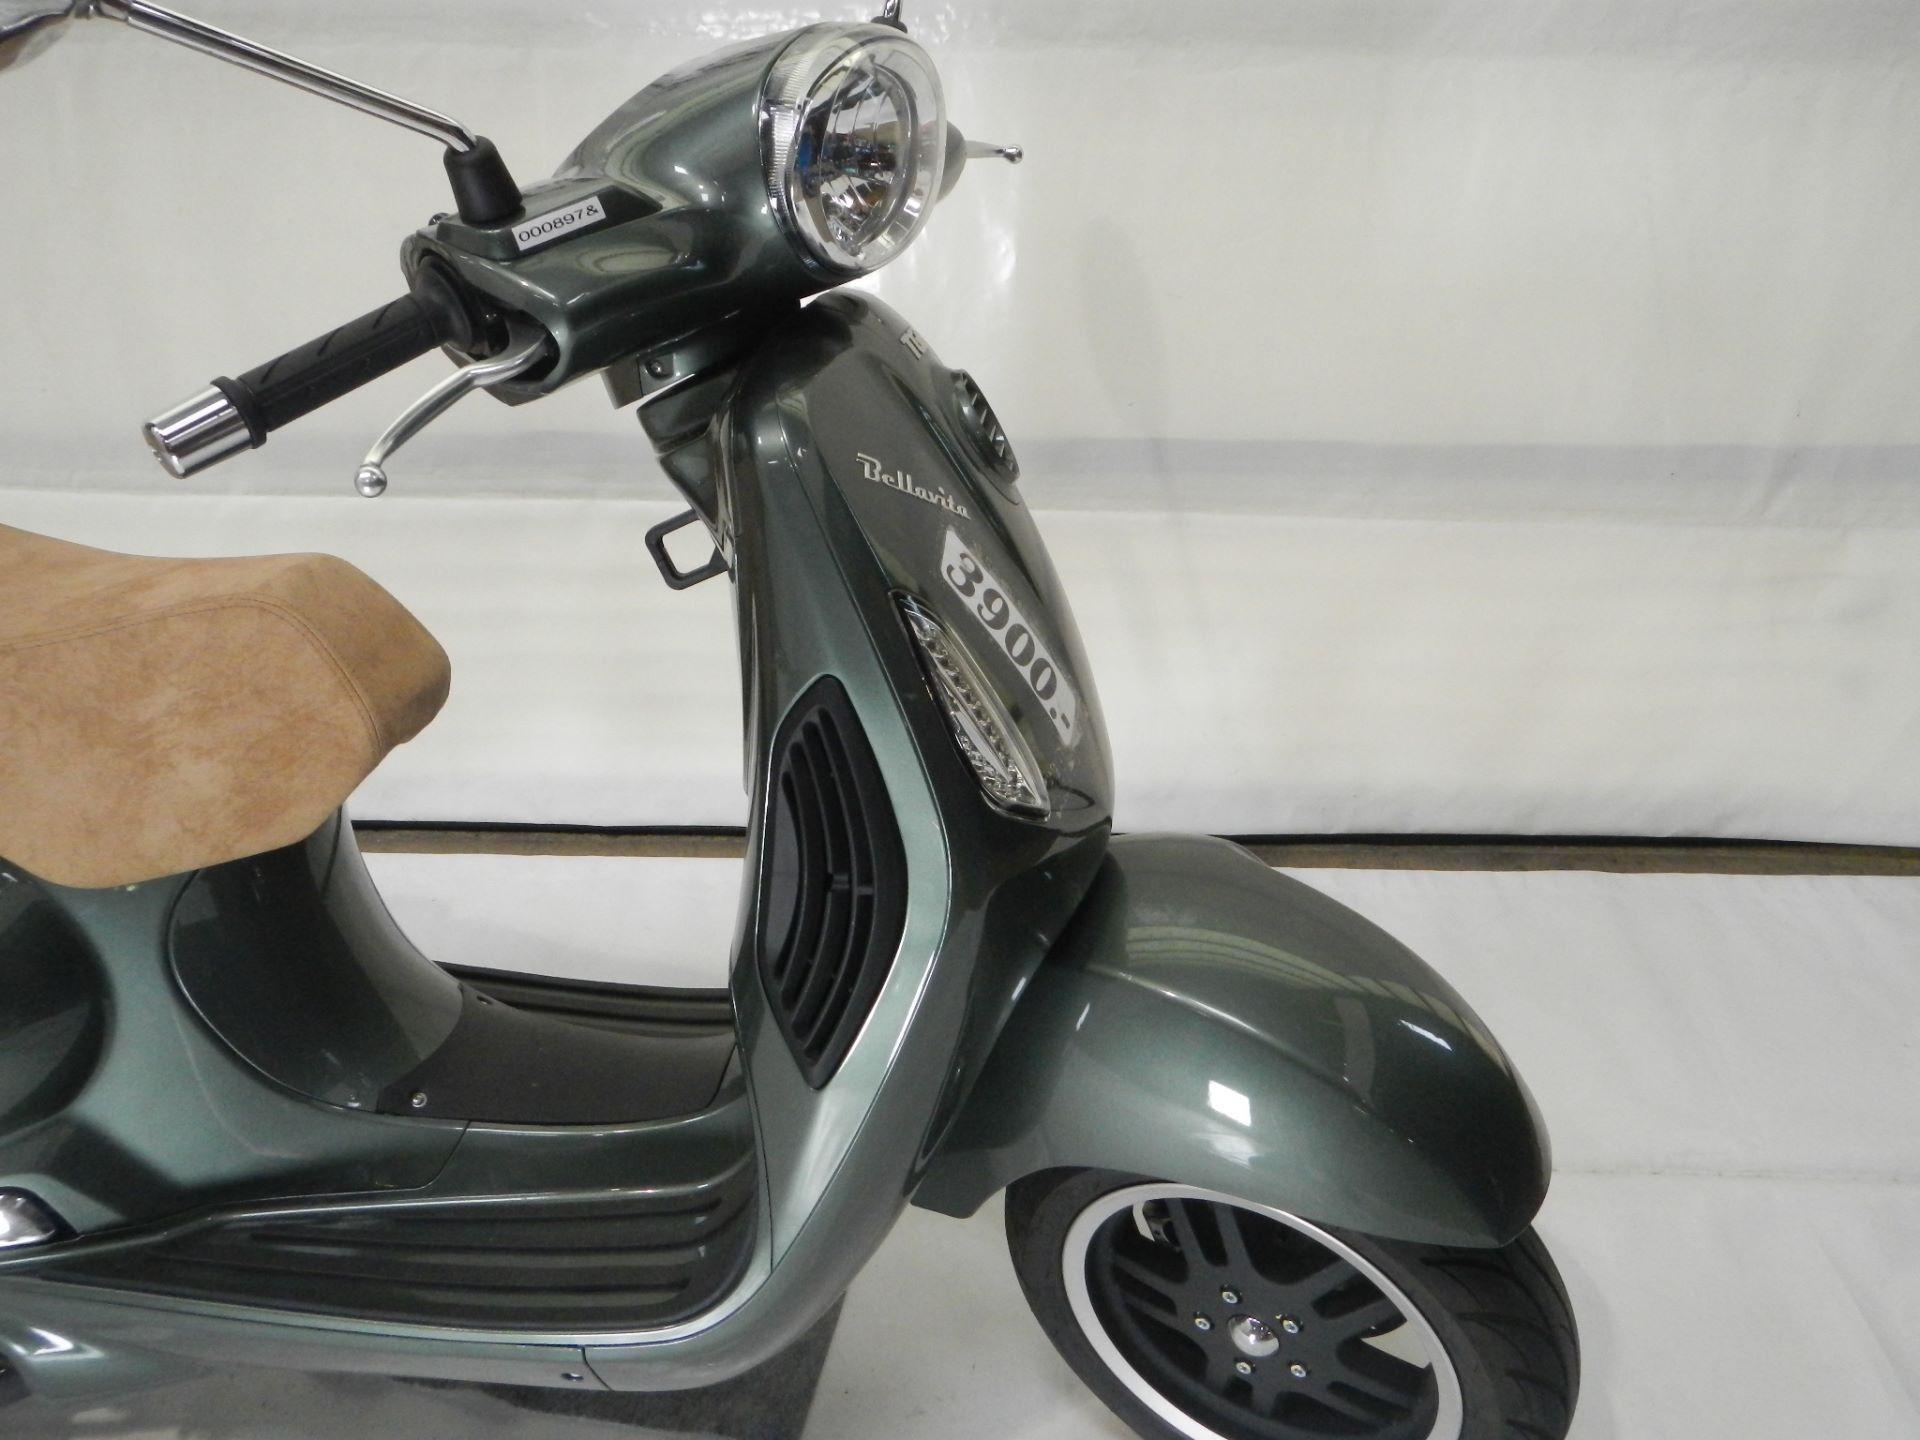 motorrad occasion kaufen tgb bellavita 125 gaberth l moto racing winznau id 7281701 zeile 142. Black Bedroom Furniture Sets. Home Design Ideas